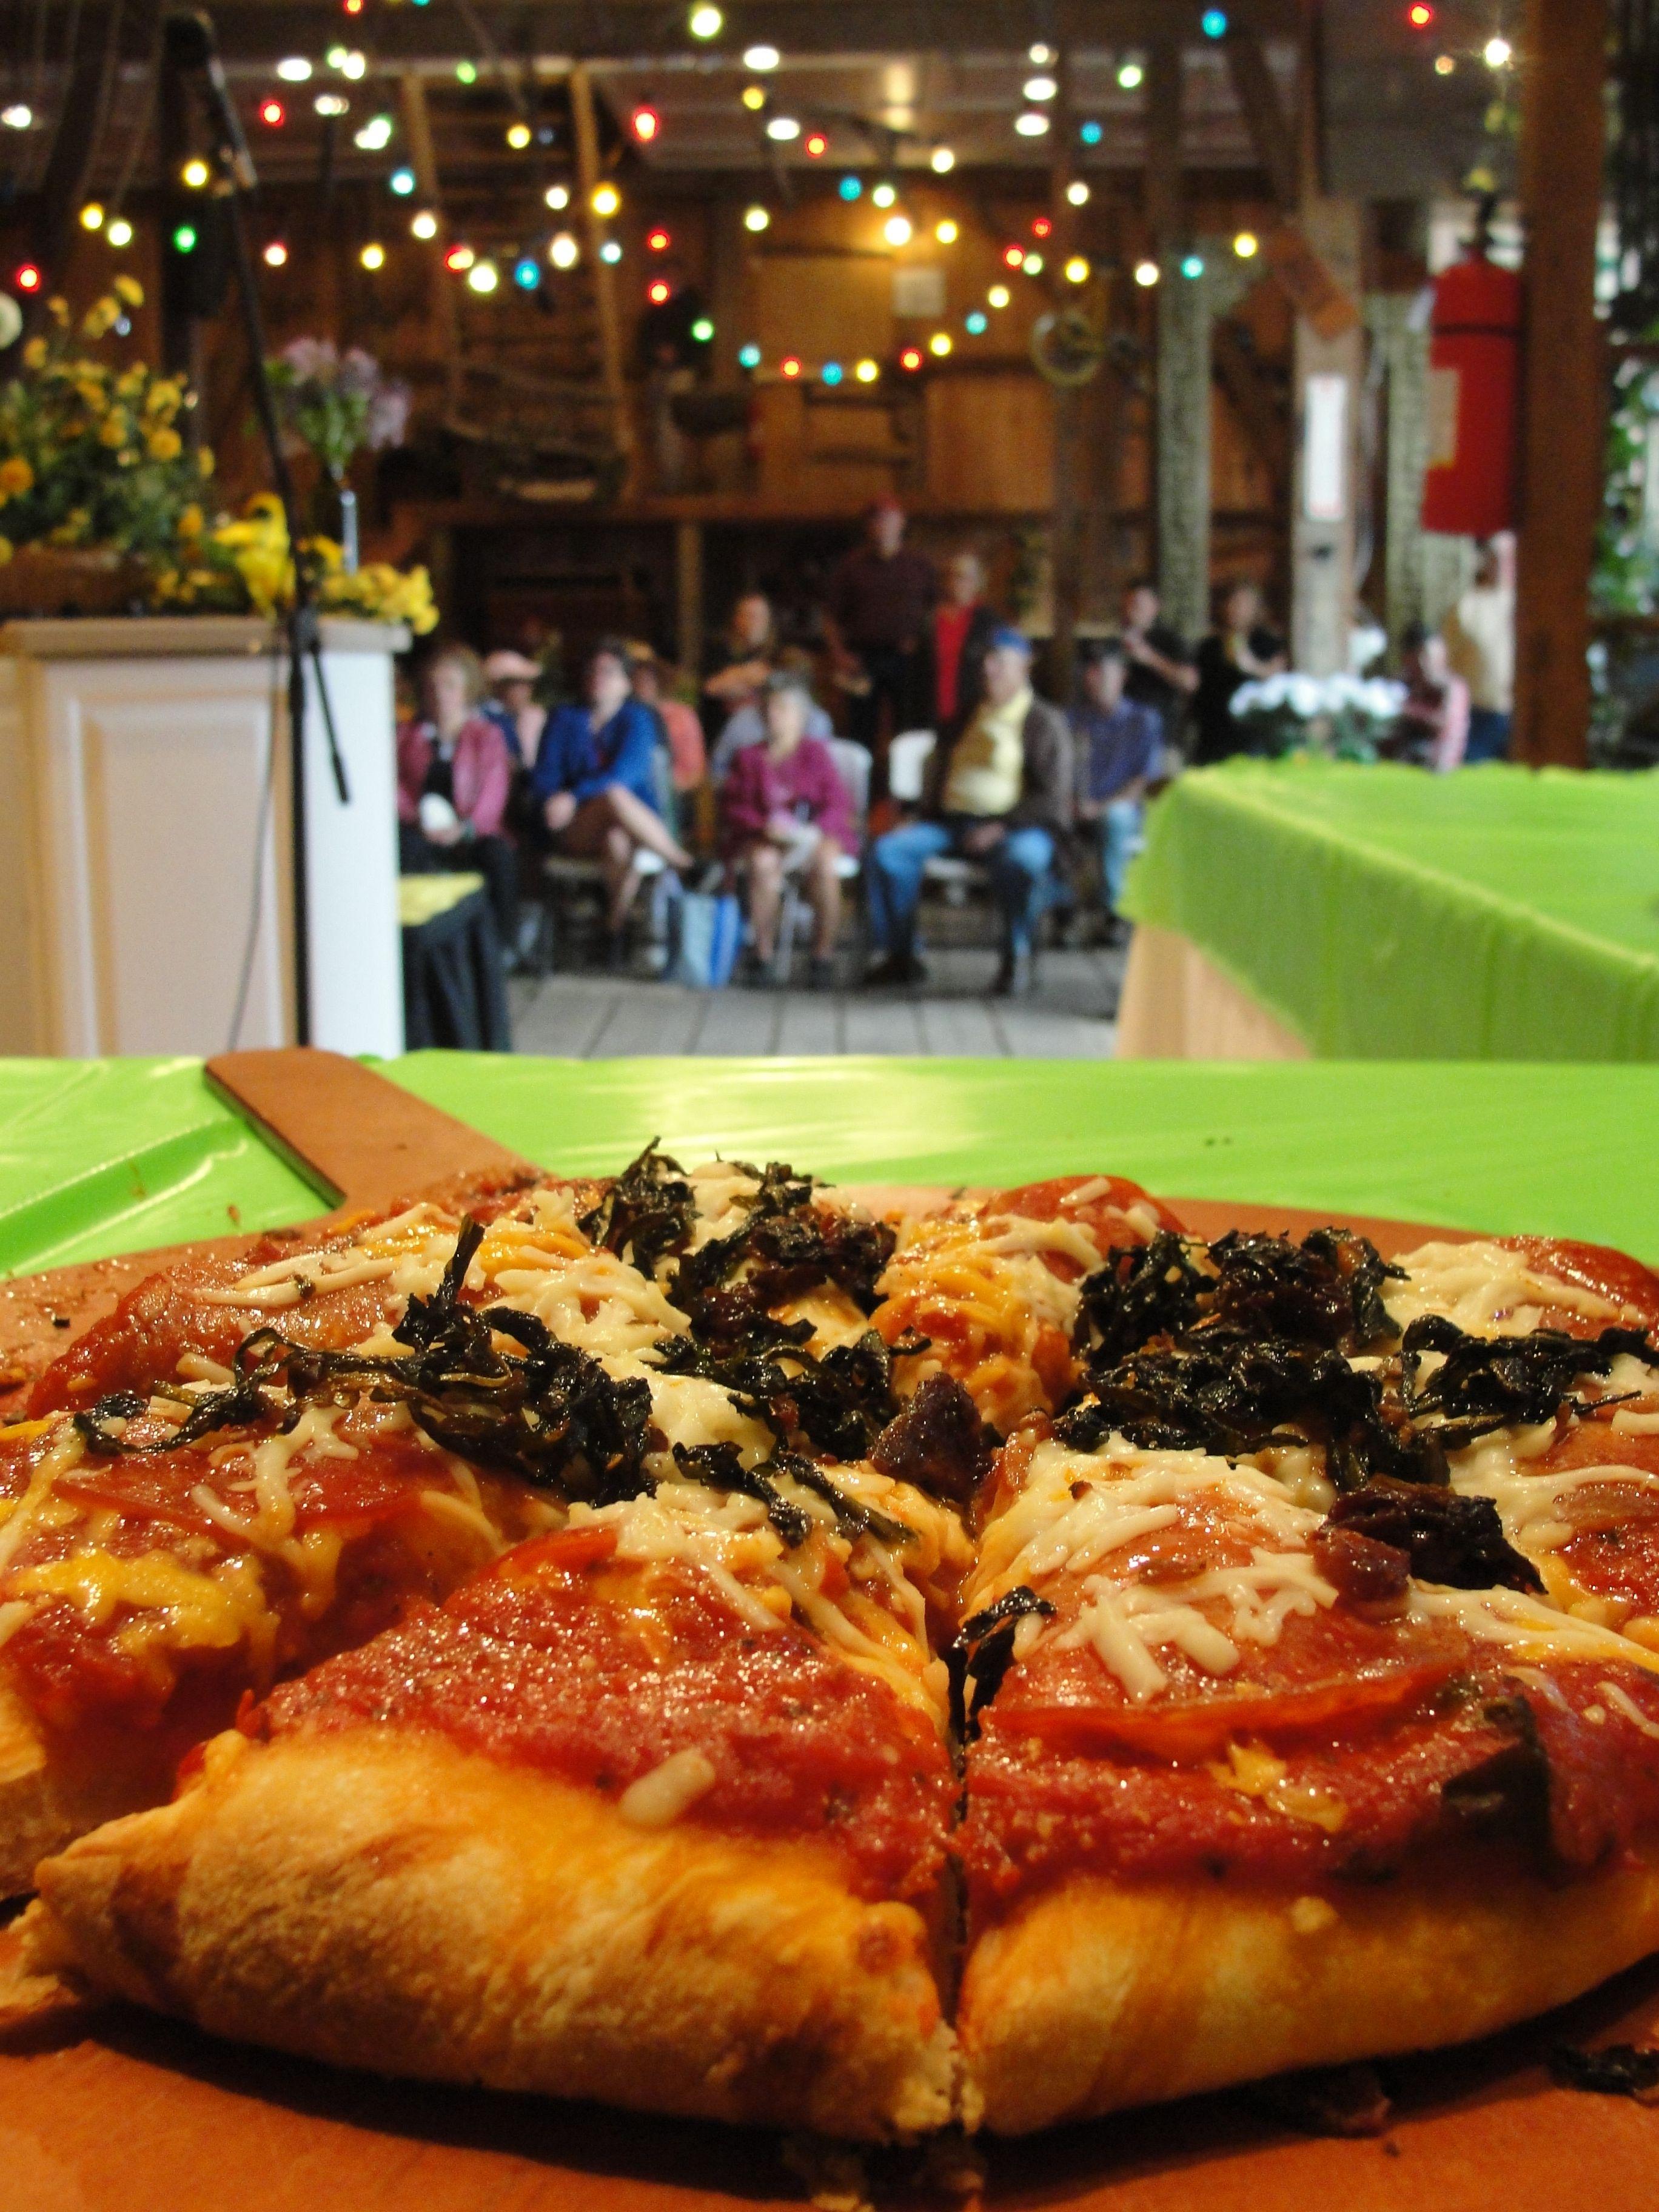 Dandelion Pizza! yum